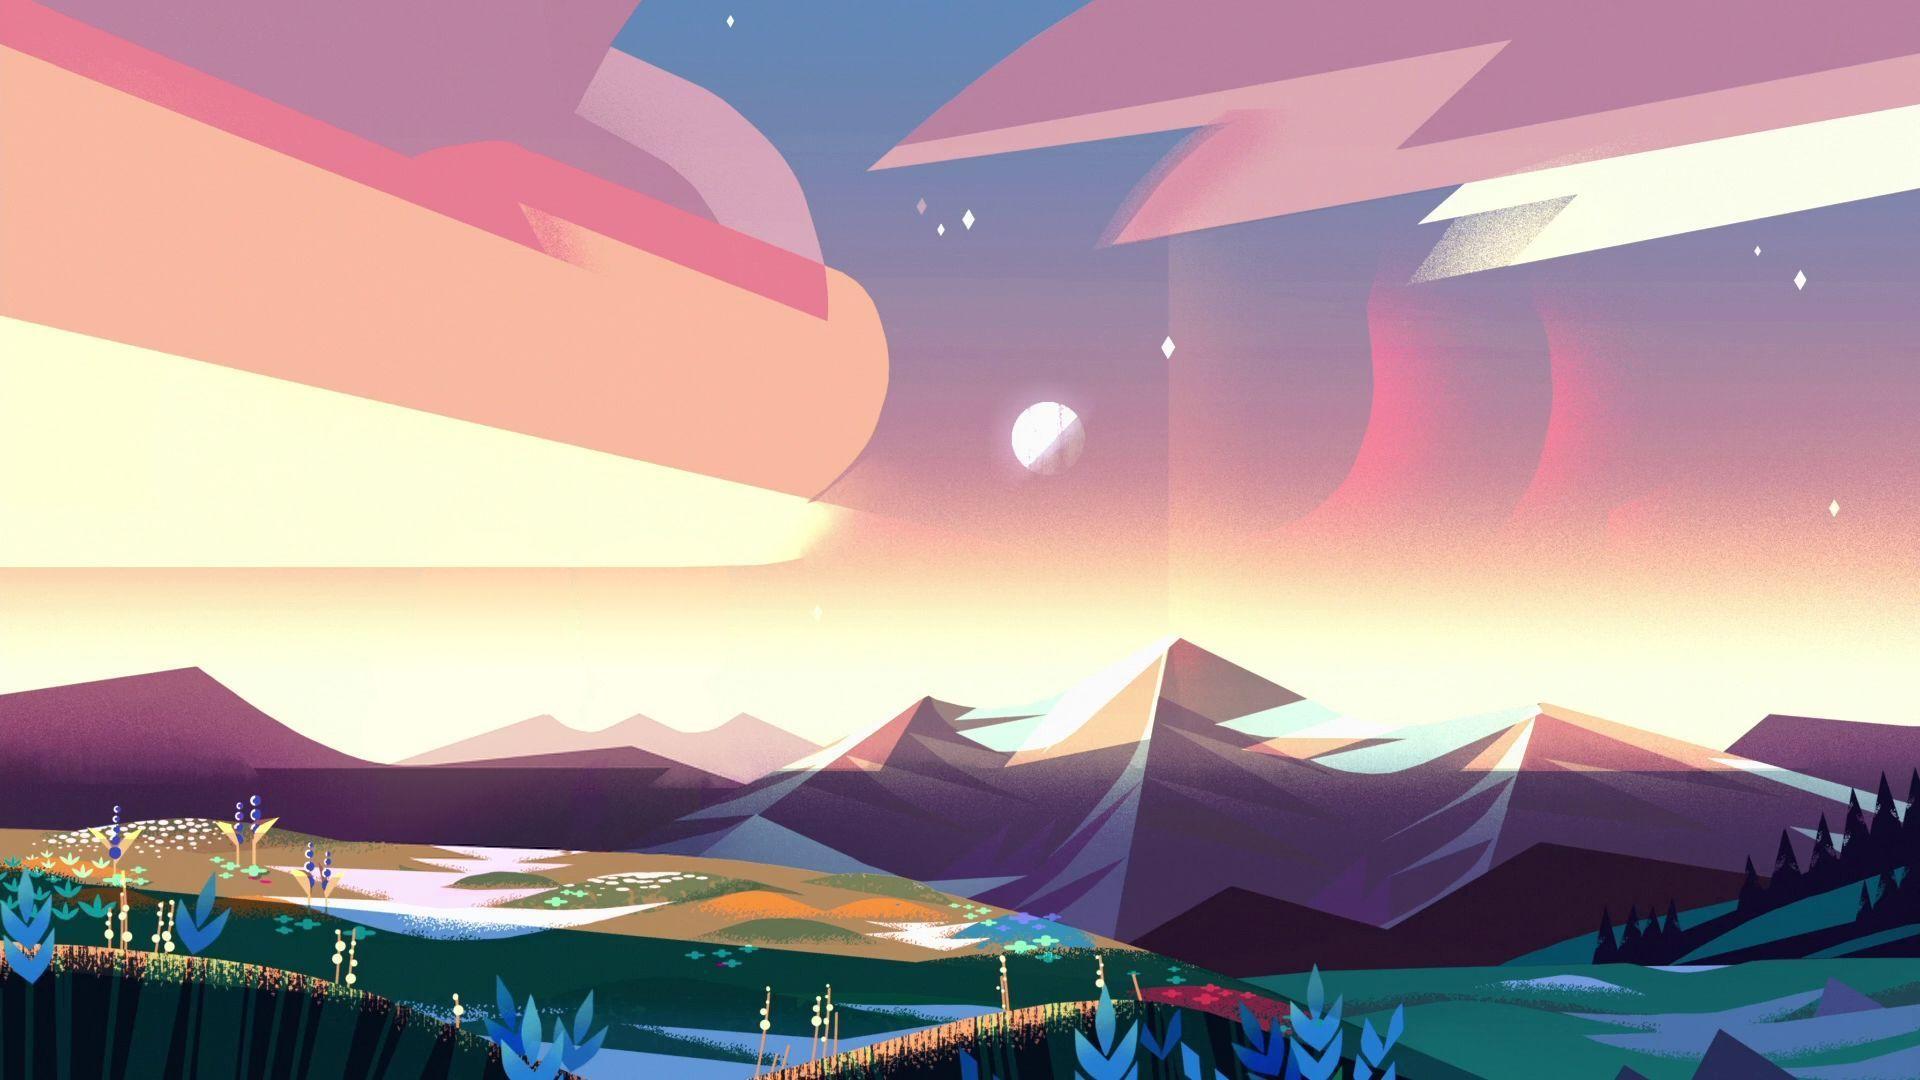 10 New Steven Universe Hd Wallpaper Full Hd 1080p For Pc Background 4k En 2020 Steven Universe Fondo De Pantalla Fondos De Steven Universe Fondos De Pantalla Para Ipad